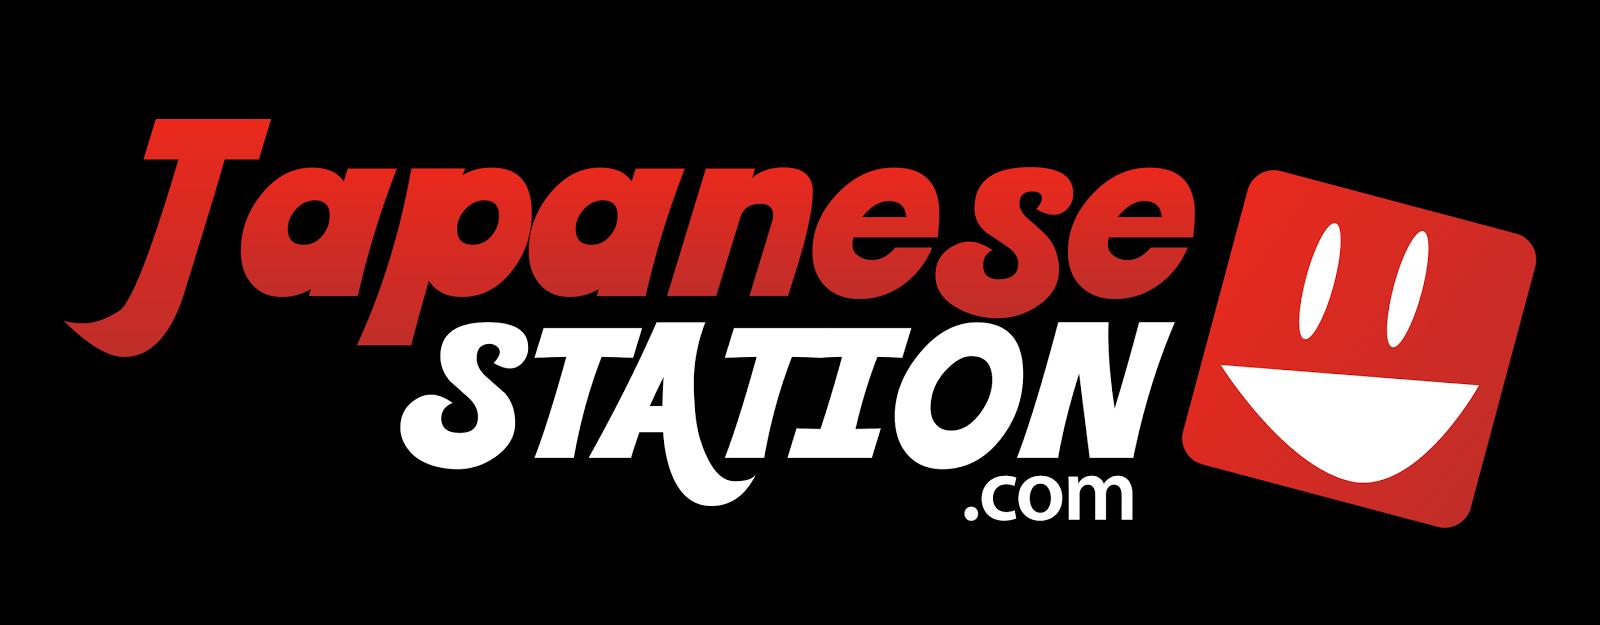 www.japanesestation.com